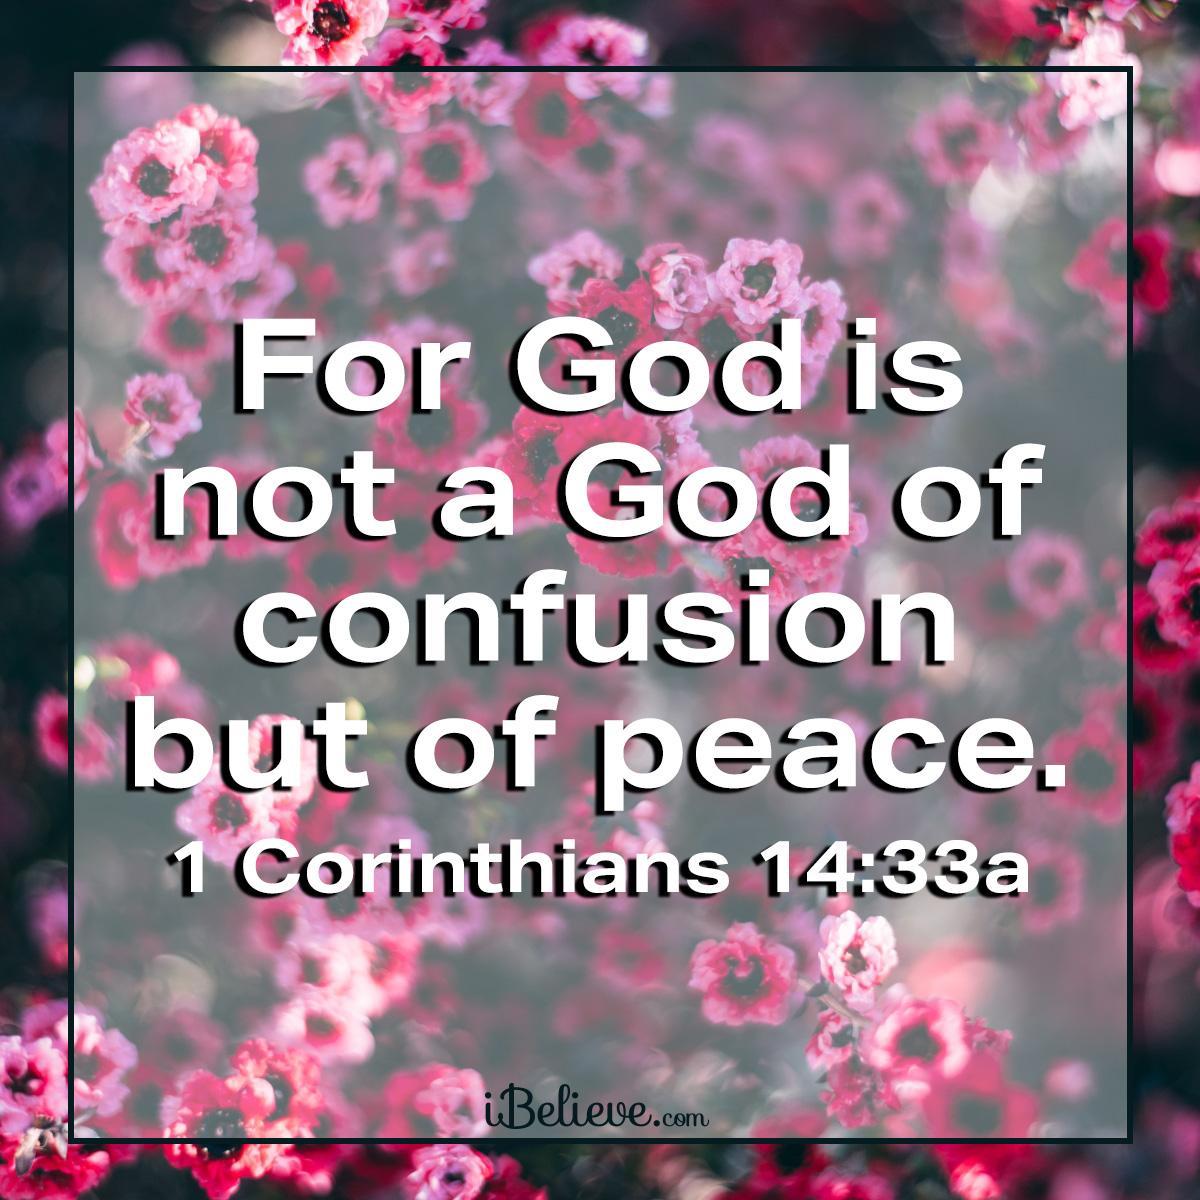 1 Corinthians 14:33 sq